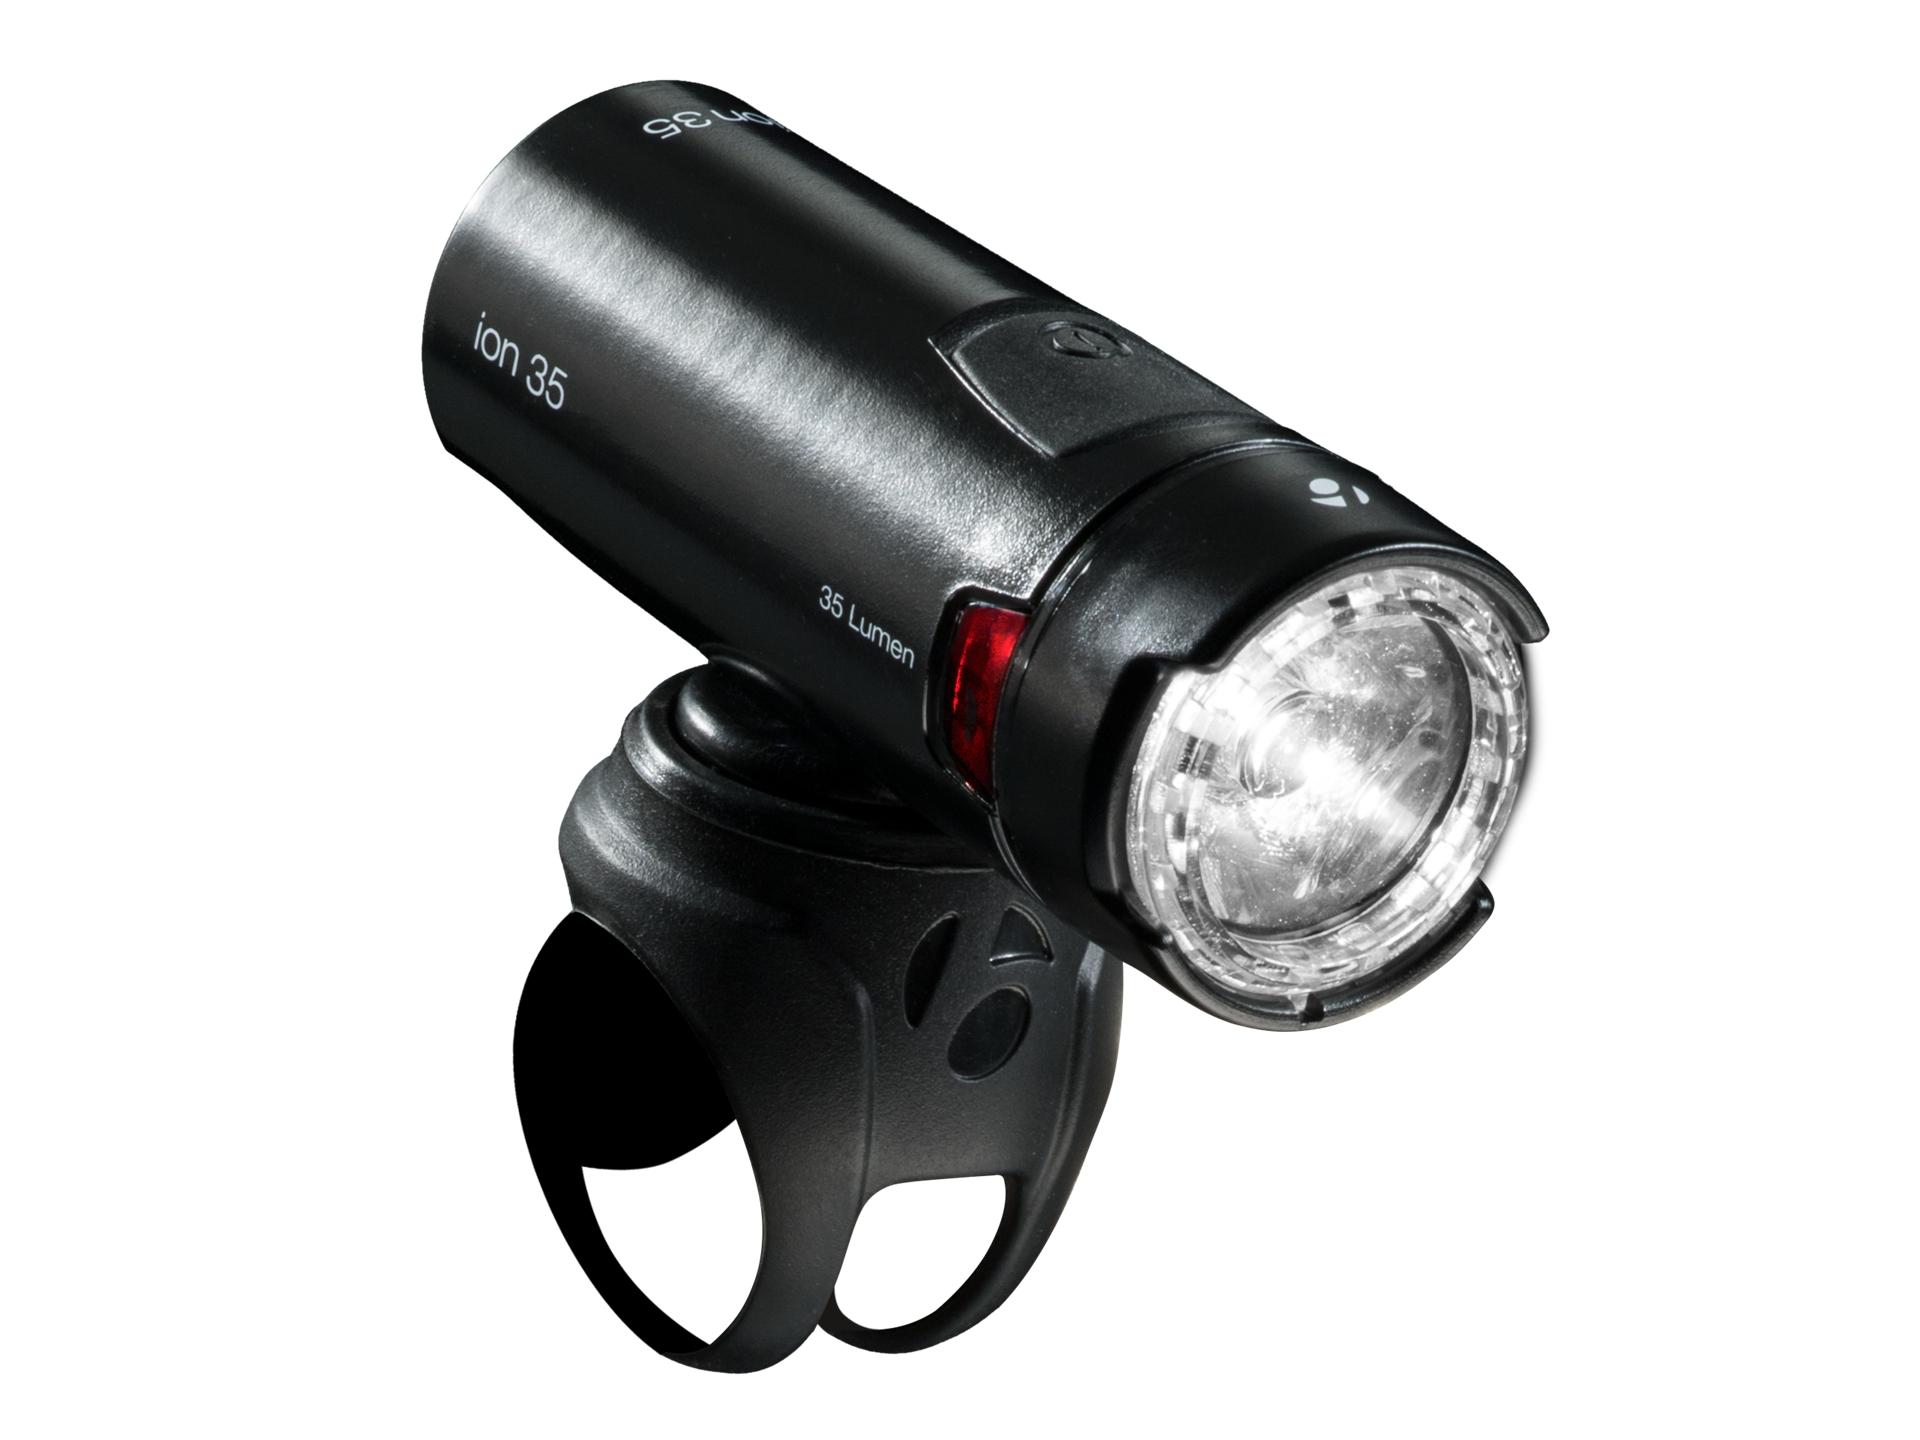 Luz Delantera para Bicicleta Bontrager Ion 35 black